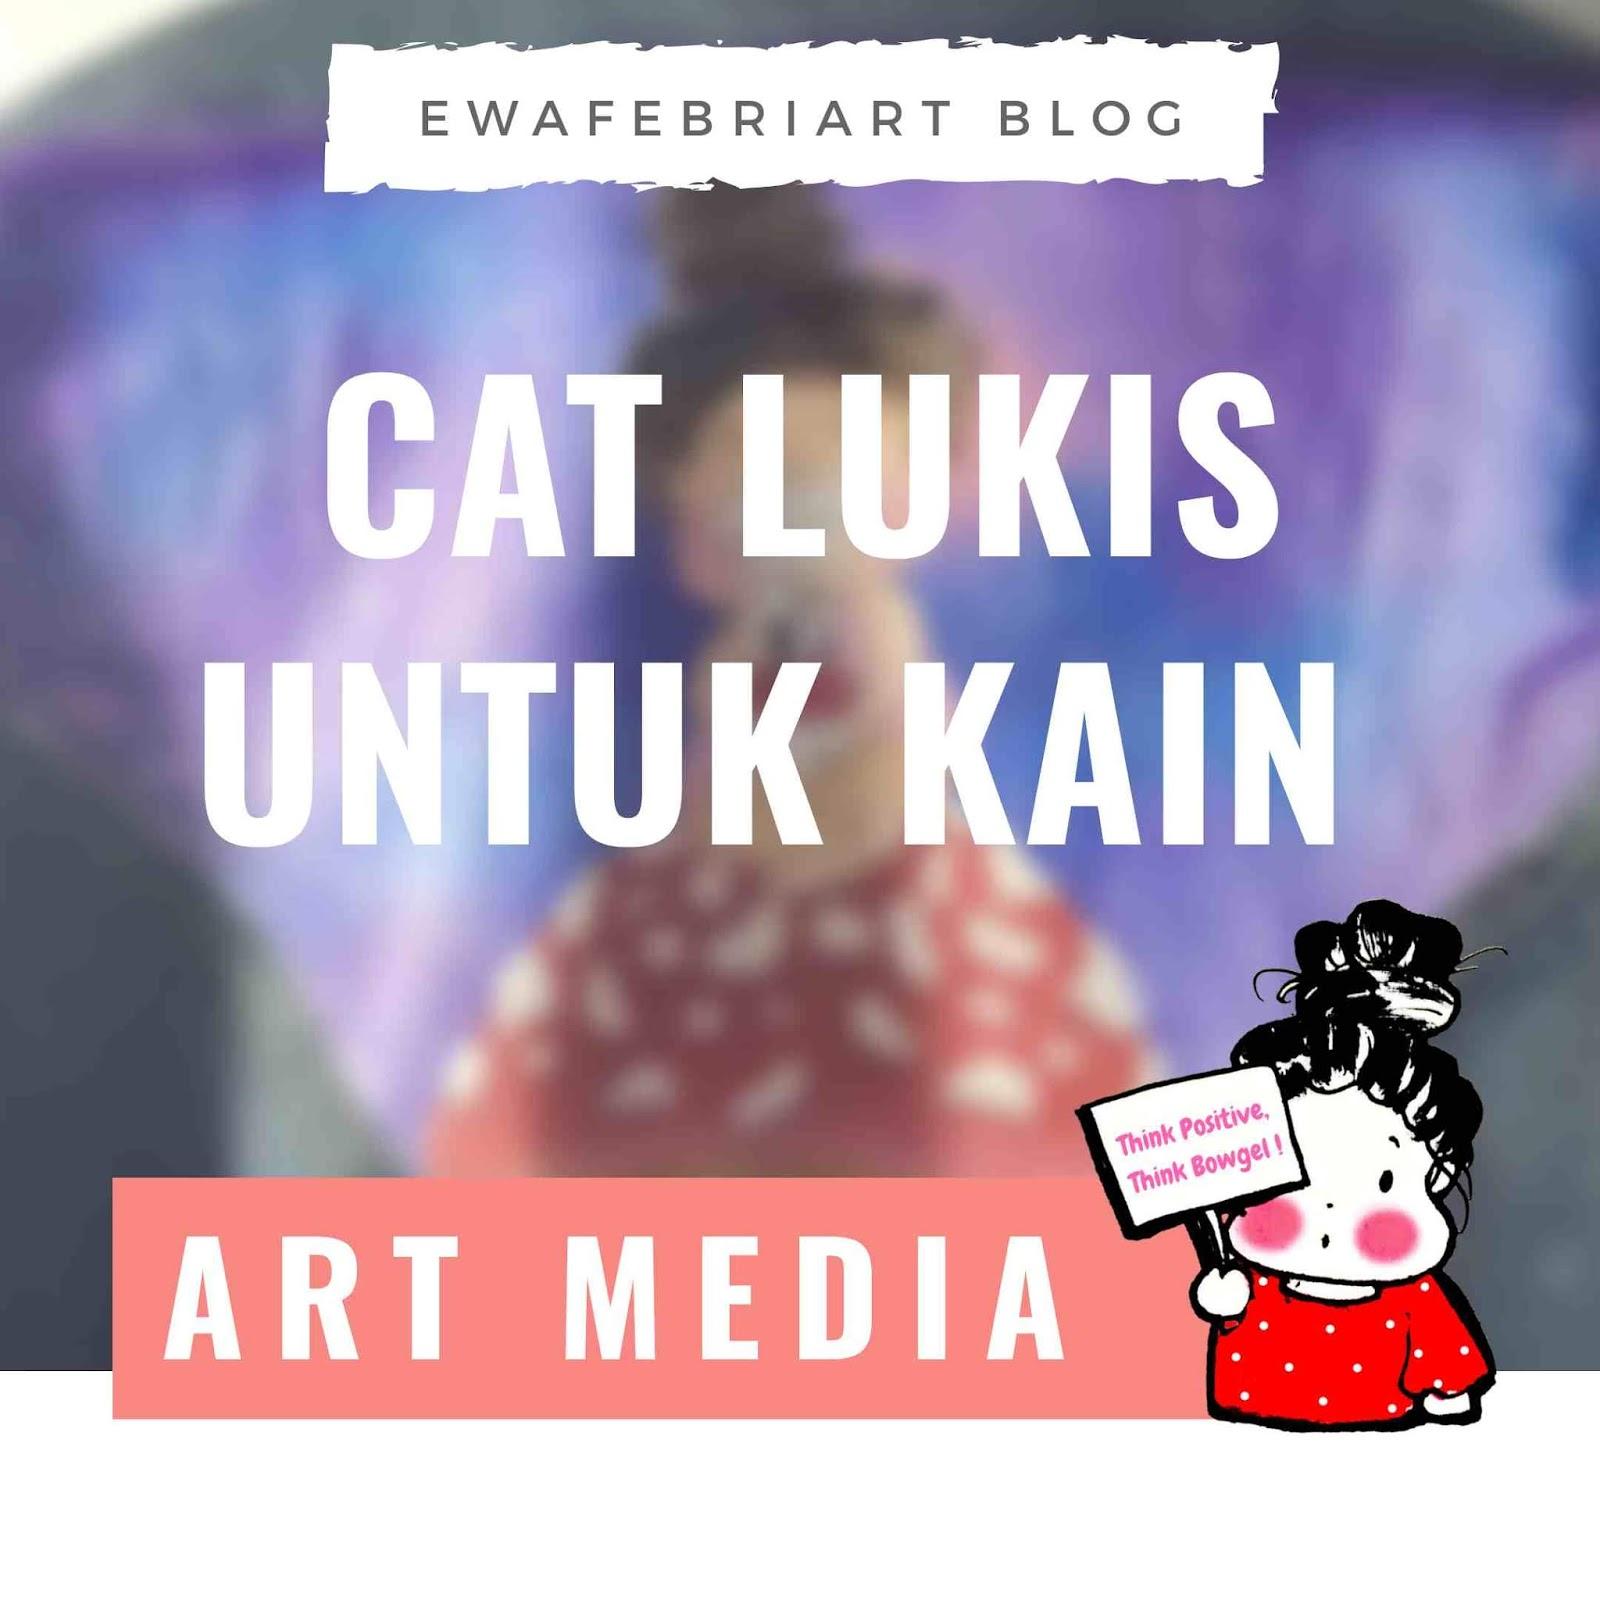 Cat Lukis Untuk Kain Ewafebriart